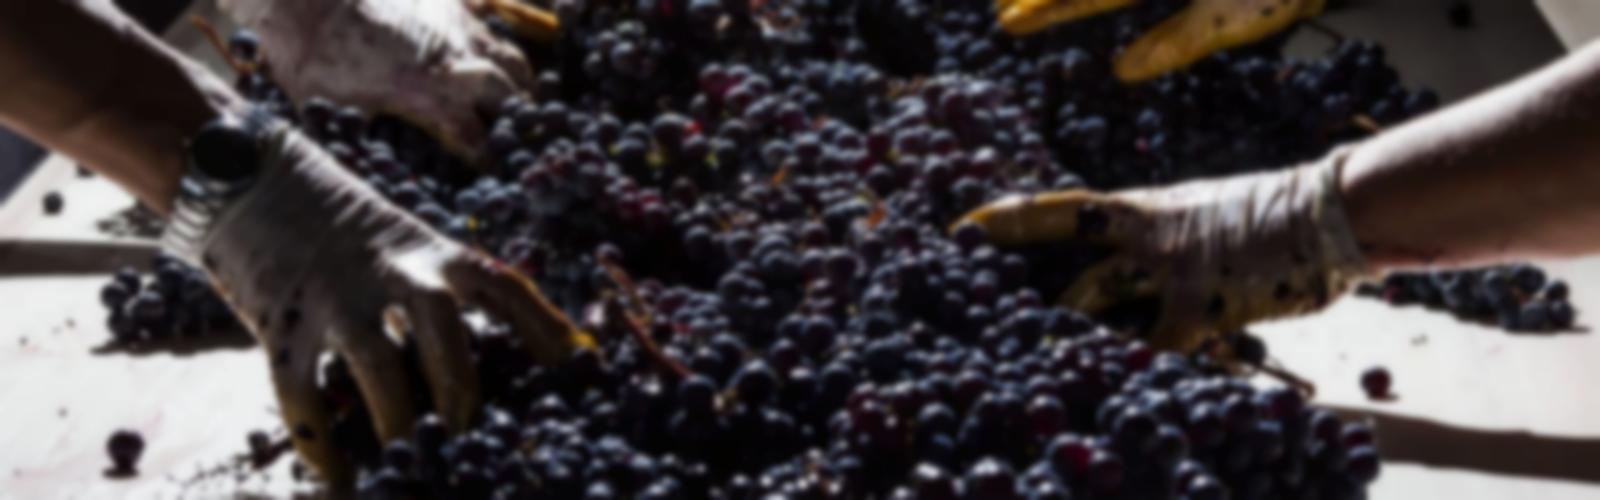 vin1600500flou